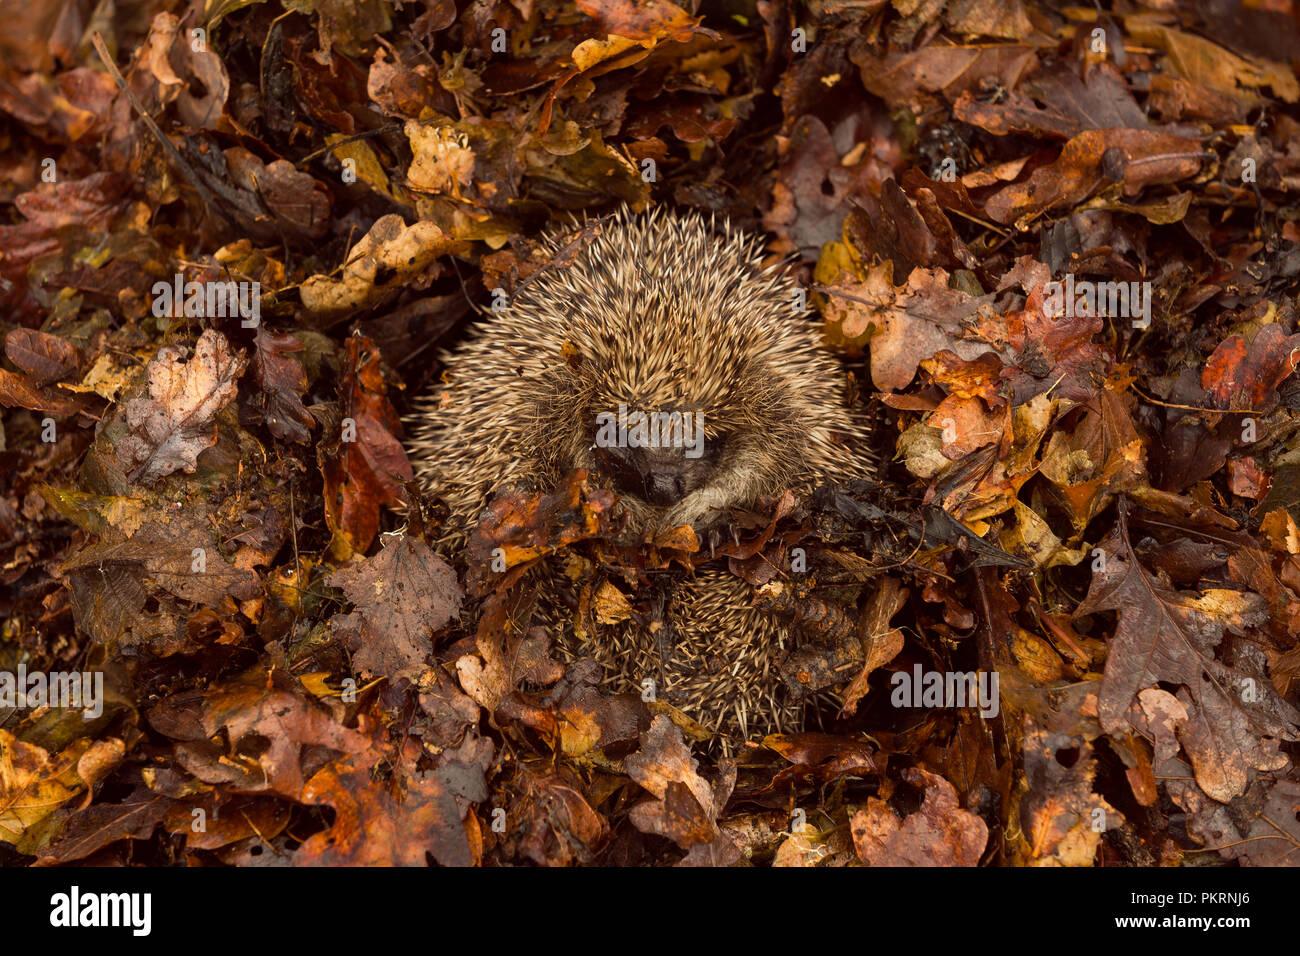 Hedgehog, native, wild, European hedgehog hibernating in Autumn leaves.  Scientific name: Erinaceus europaeus.  Landscape - Stock Image